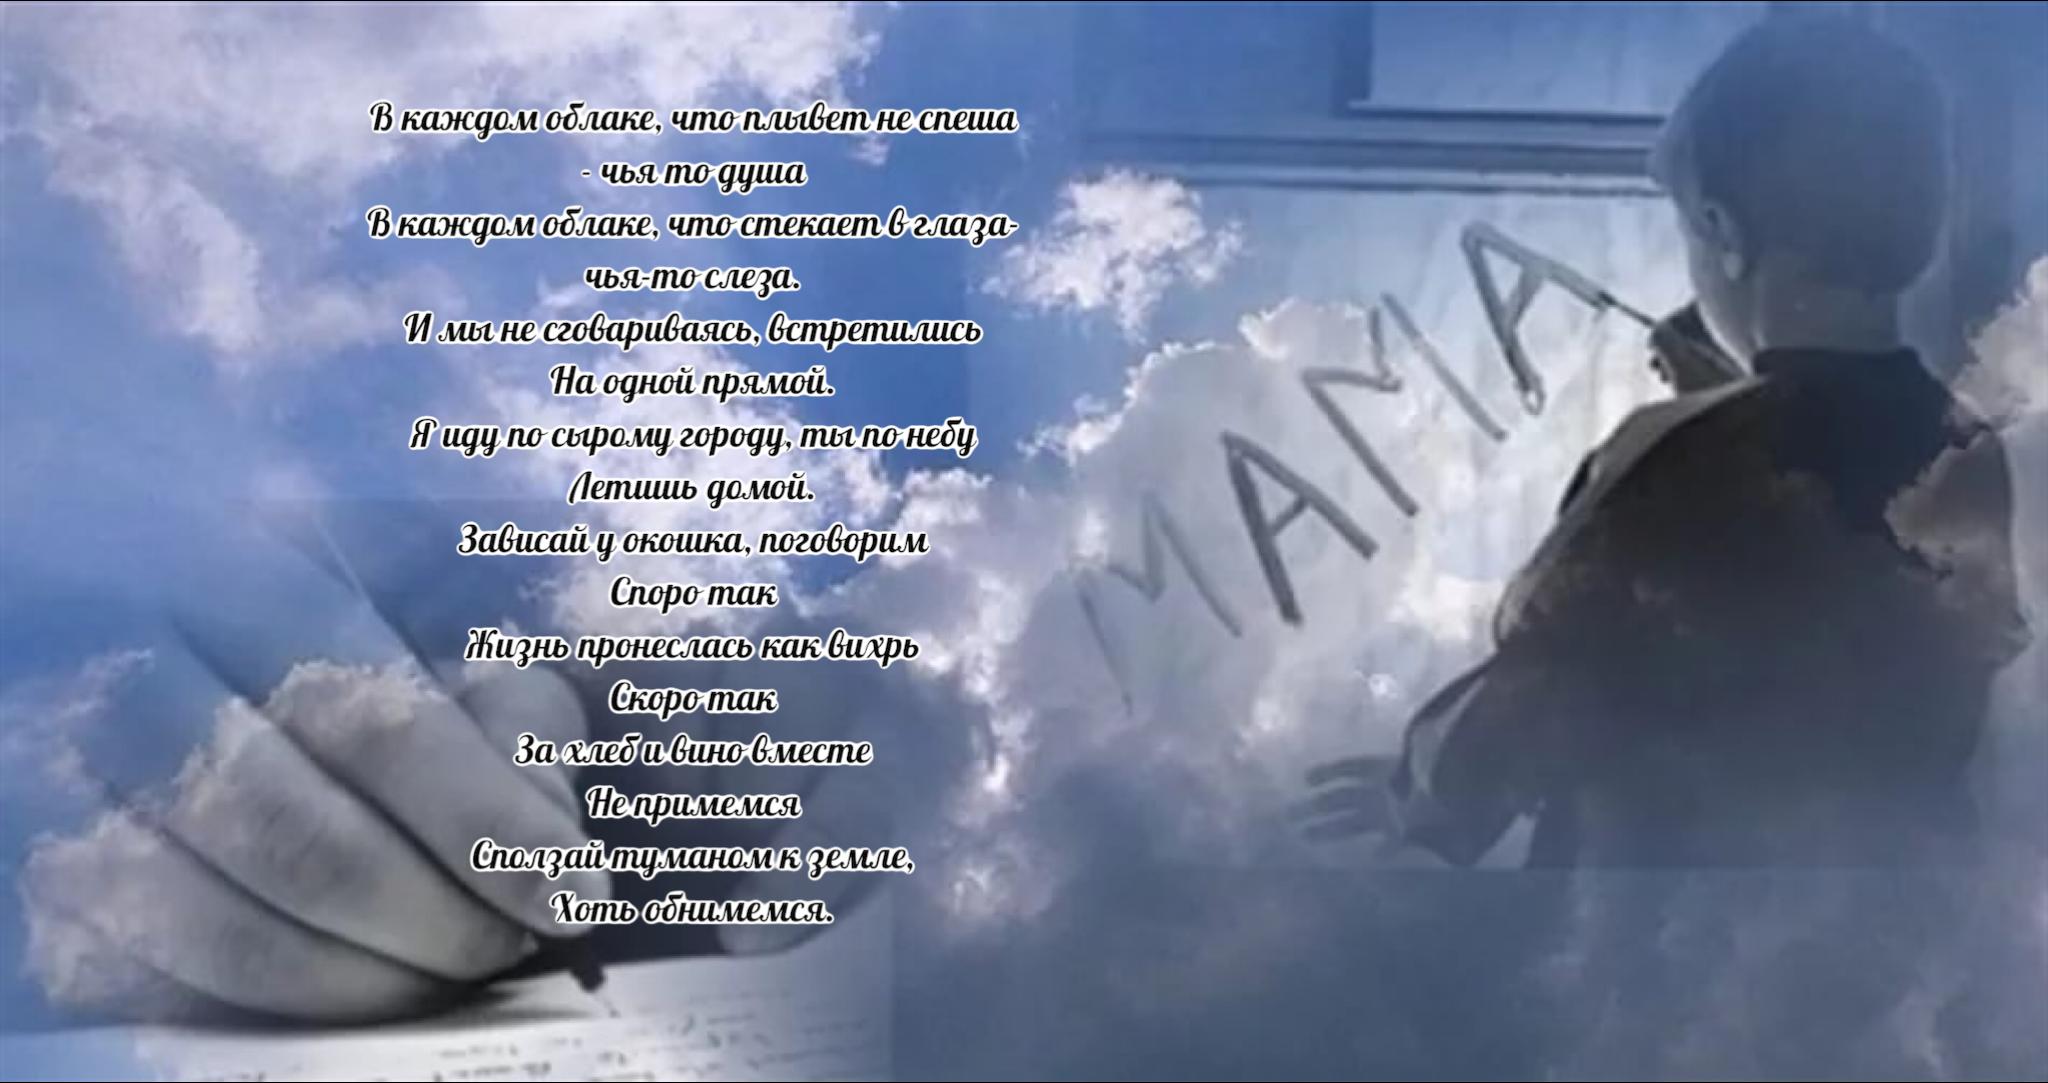 https://i6.imageban.ru/out/2020/05/10/a86764288ed5ae38bbbdf94f4b562f81.png